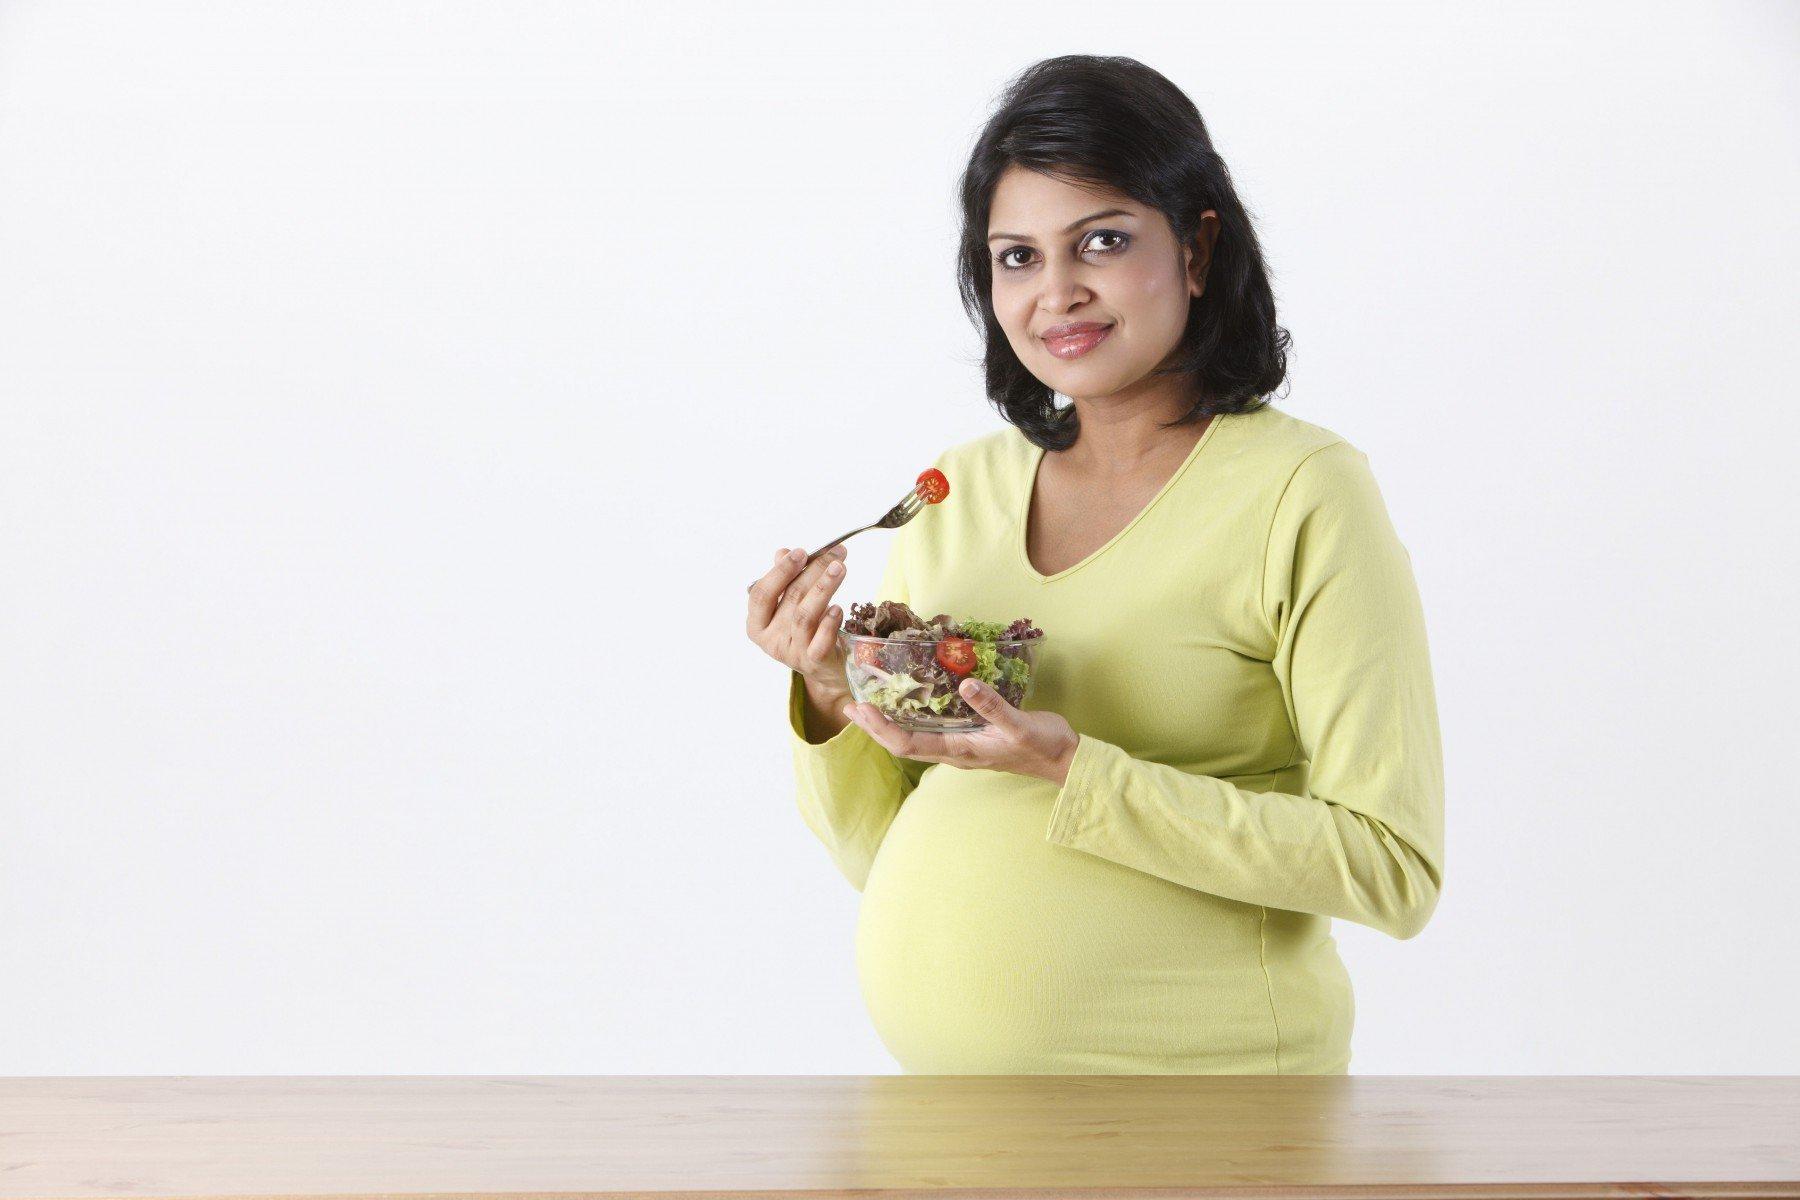 pregnancy precautions